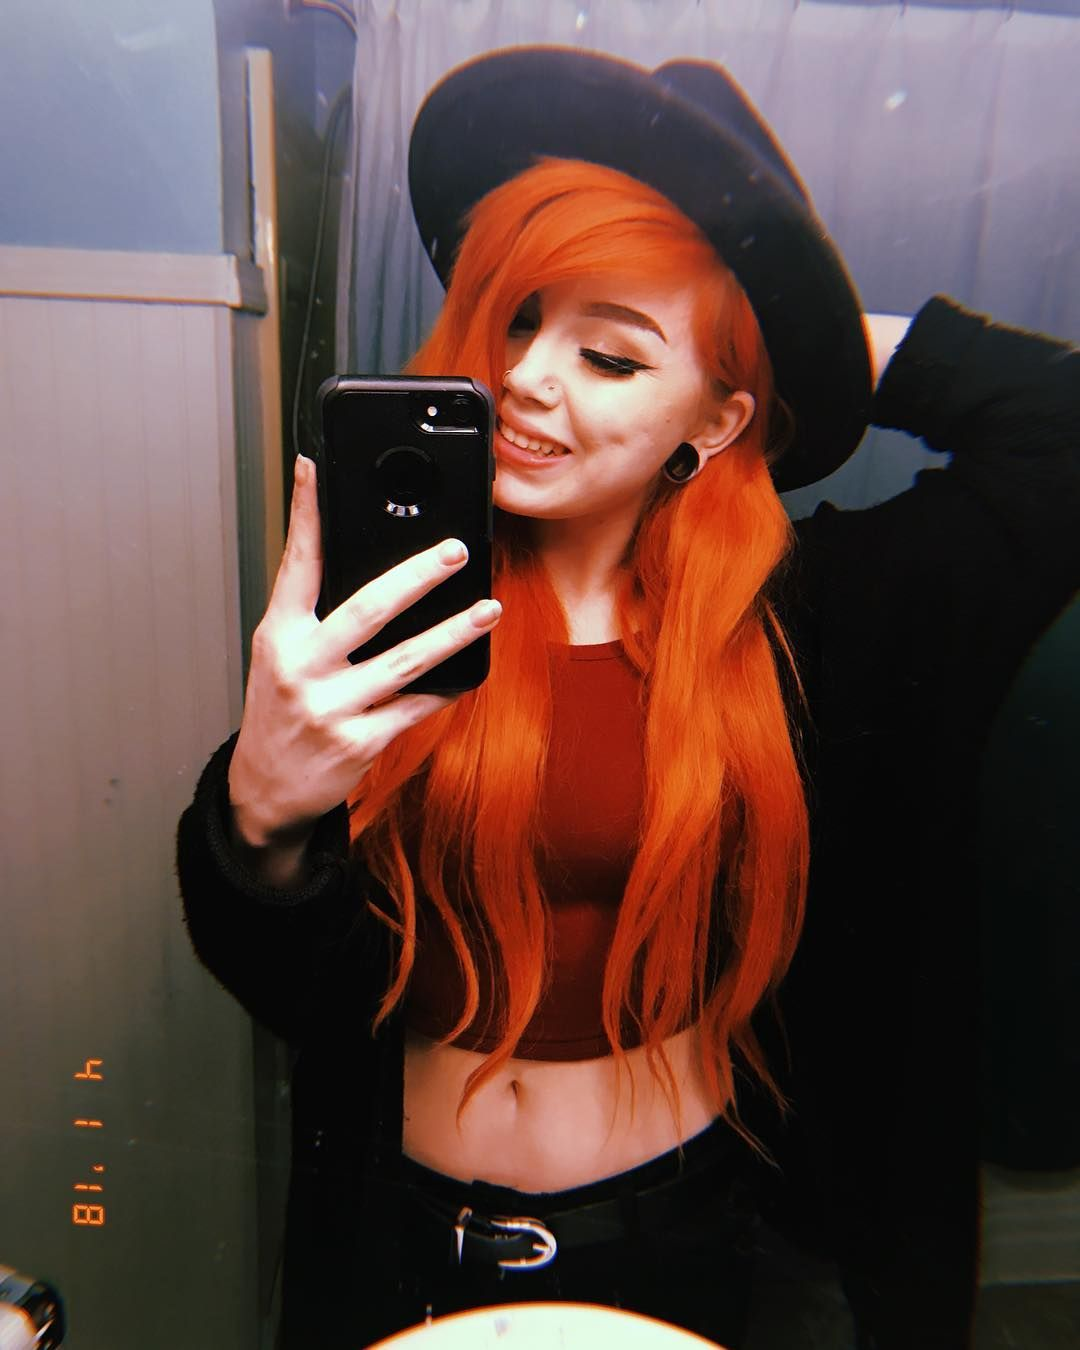 Fuck Claudia Guarnieri nudes (74 photo), Topless, Hot, Selfie, braless 2017